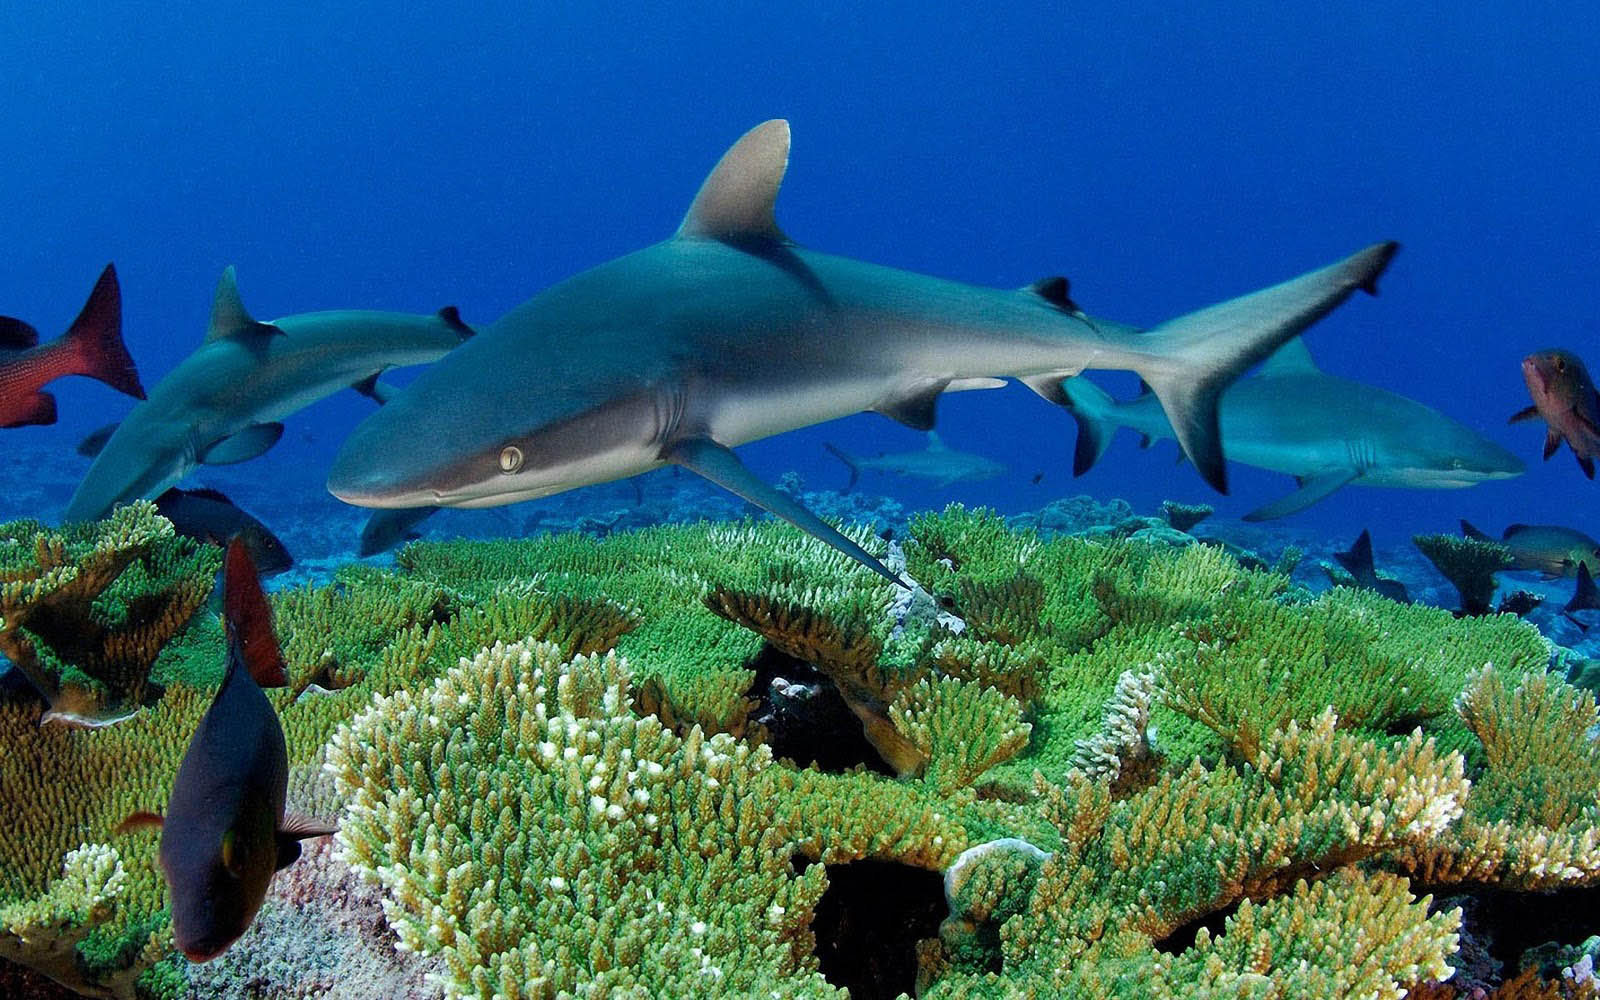 download shark wallpapers wallpaper - photo #29